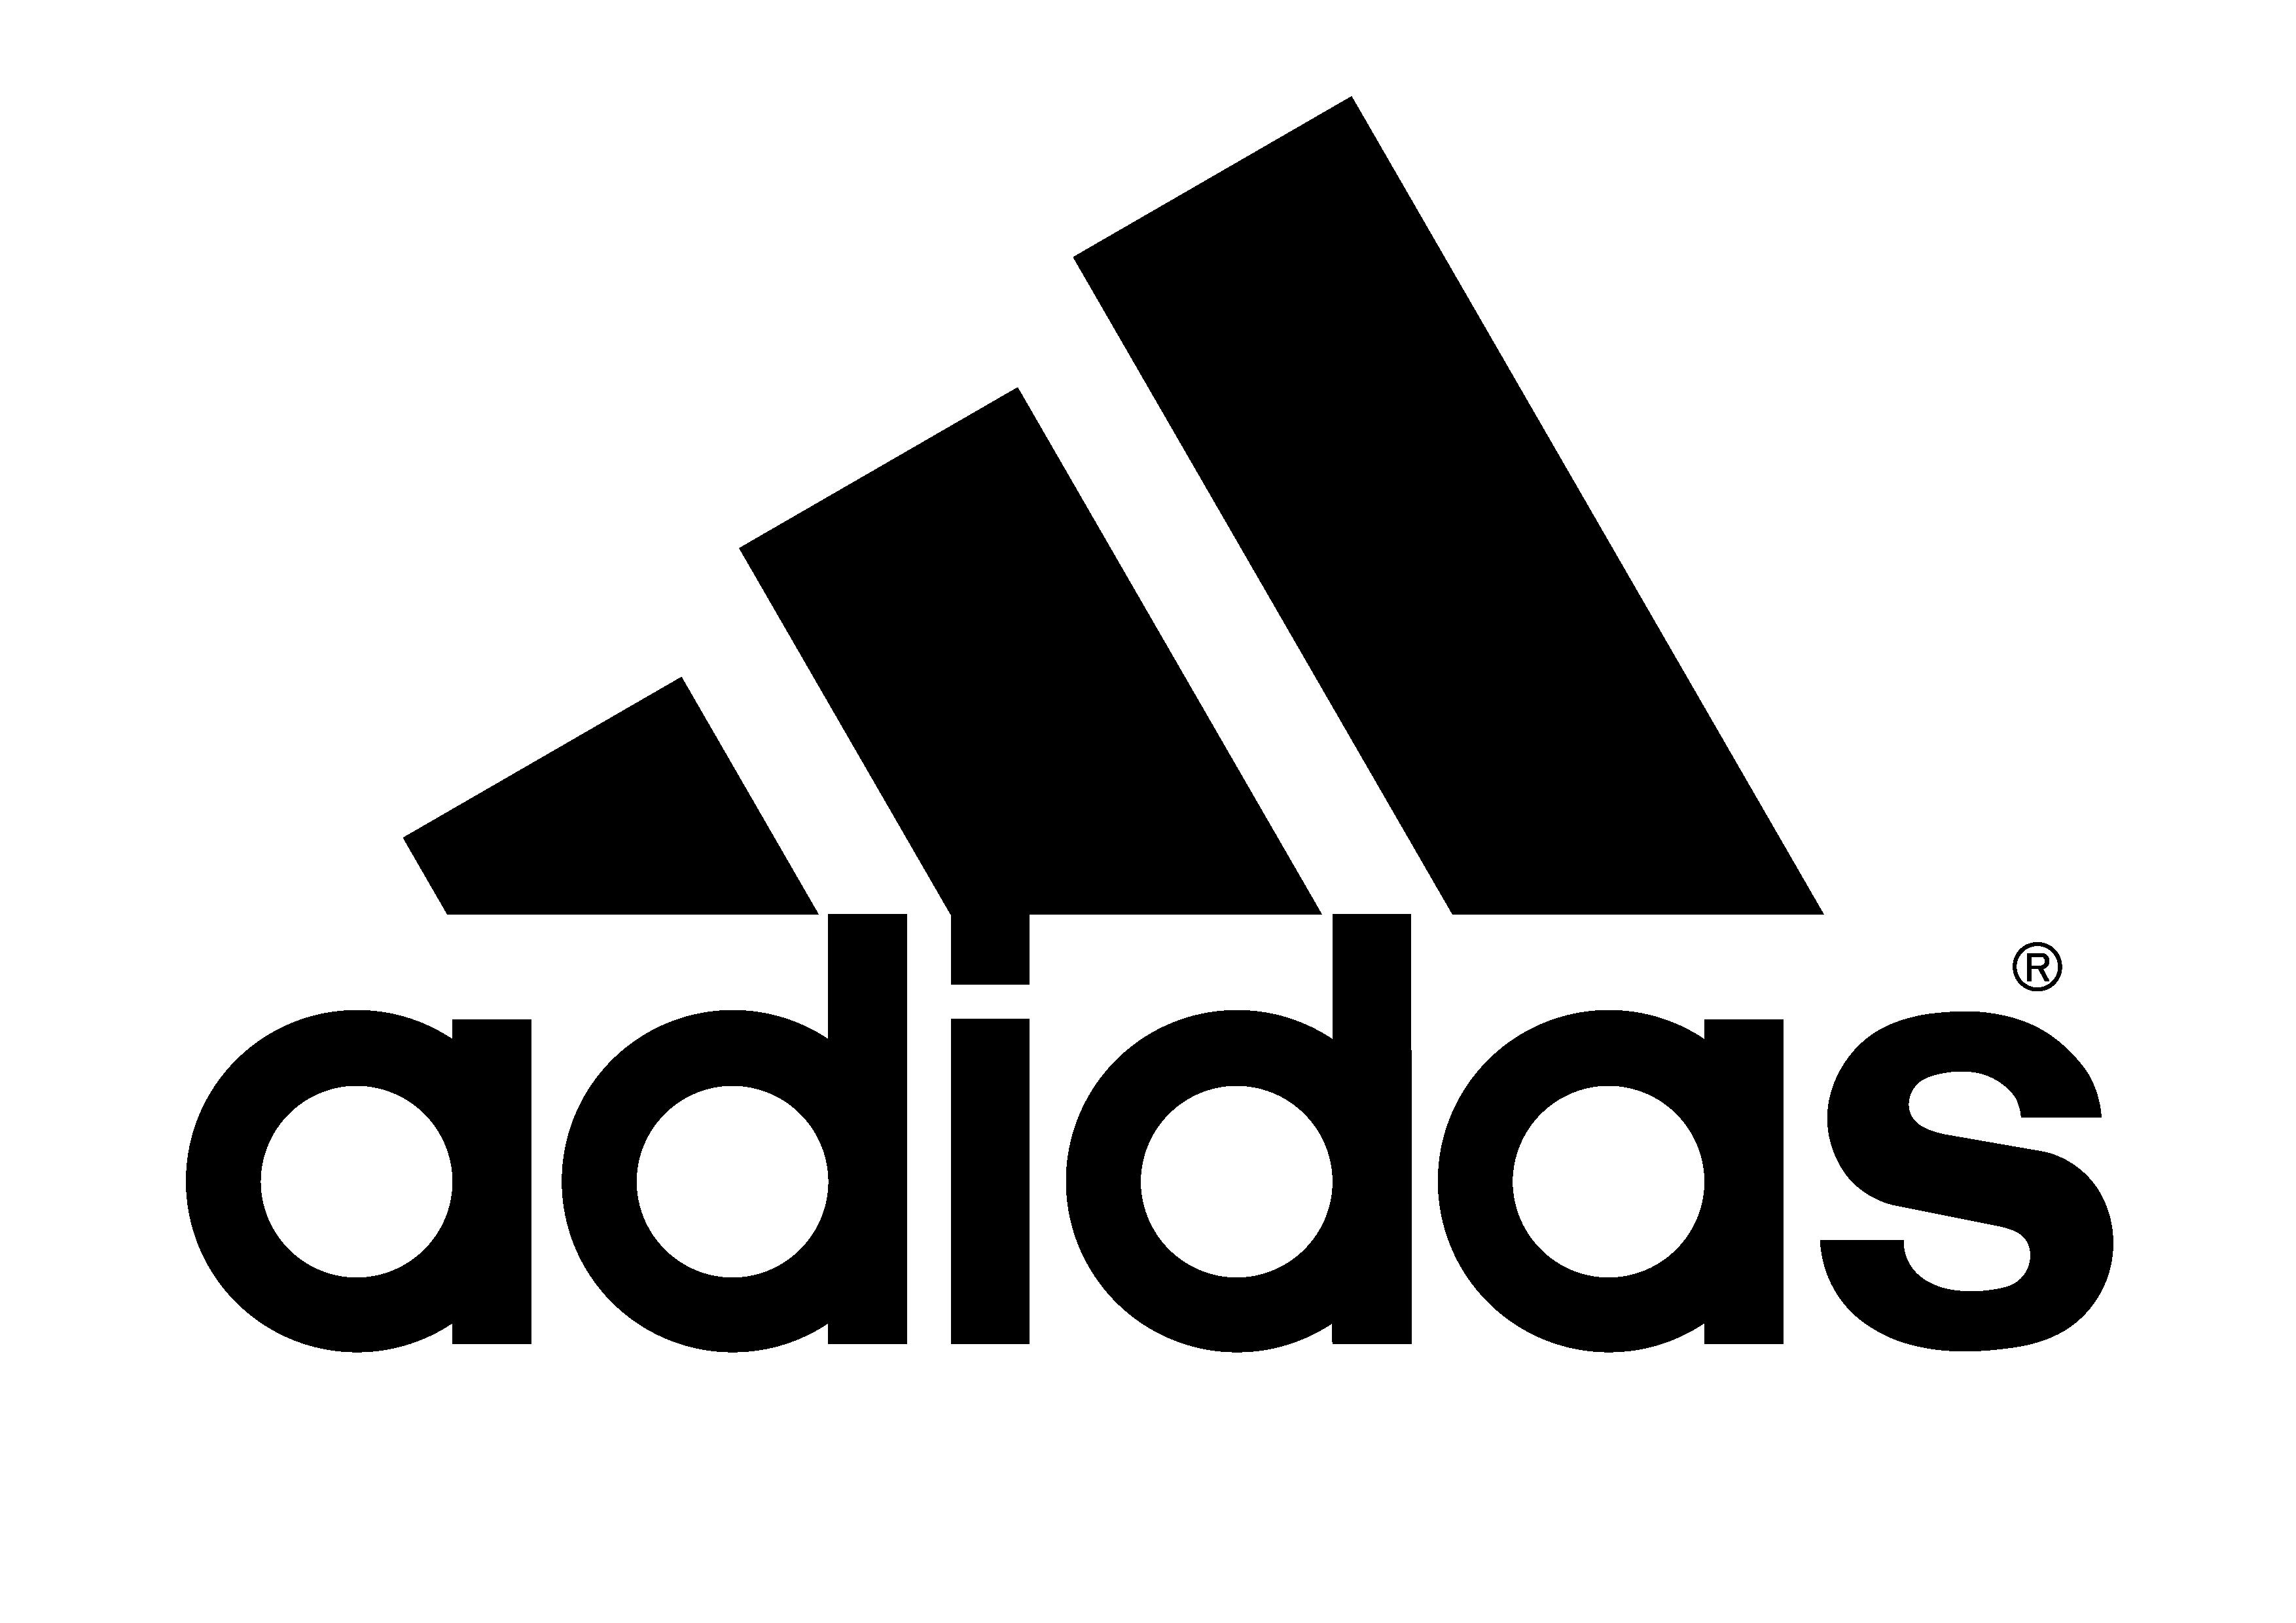 Logos de marcas png 5 » PNG Image.